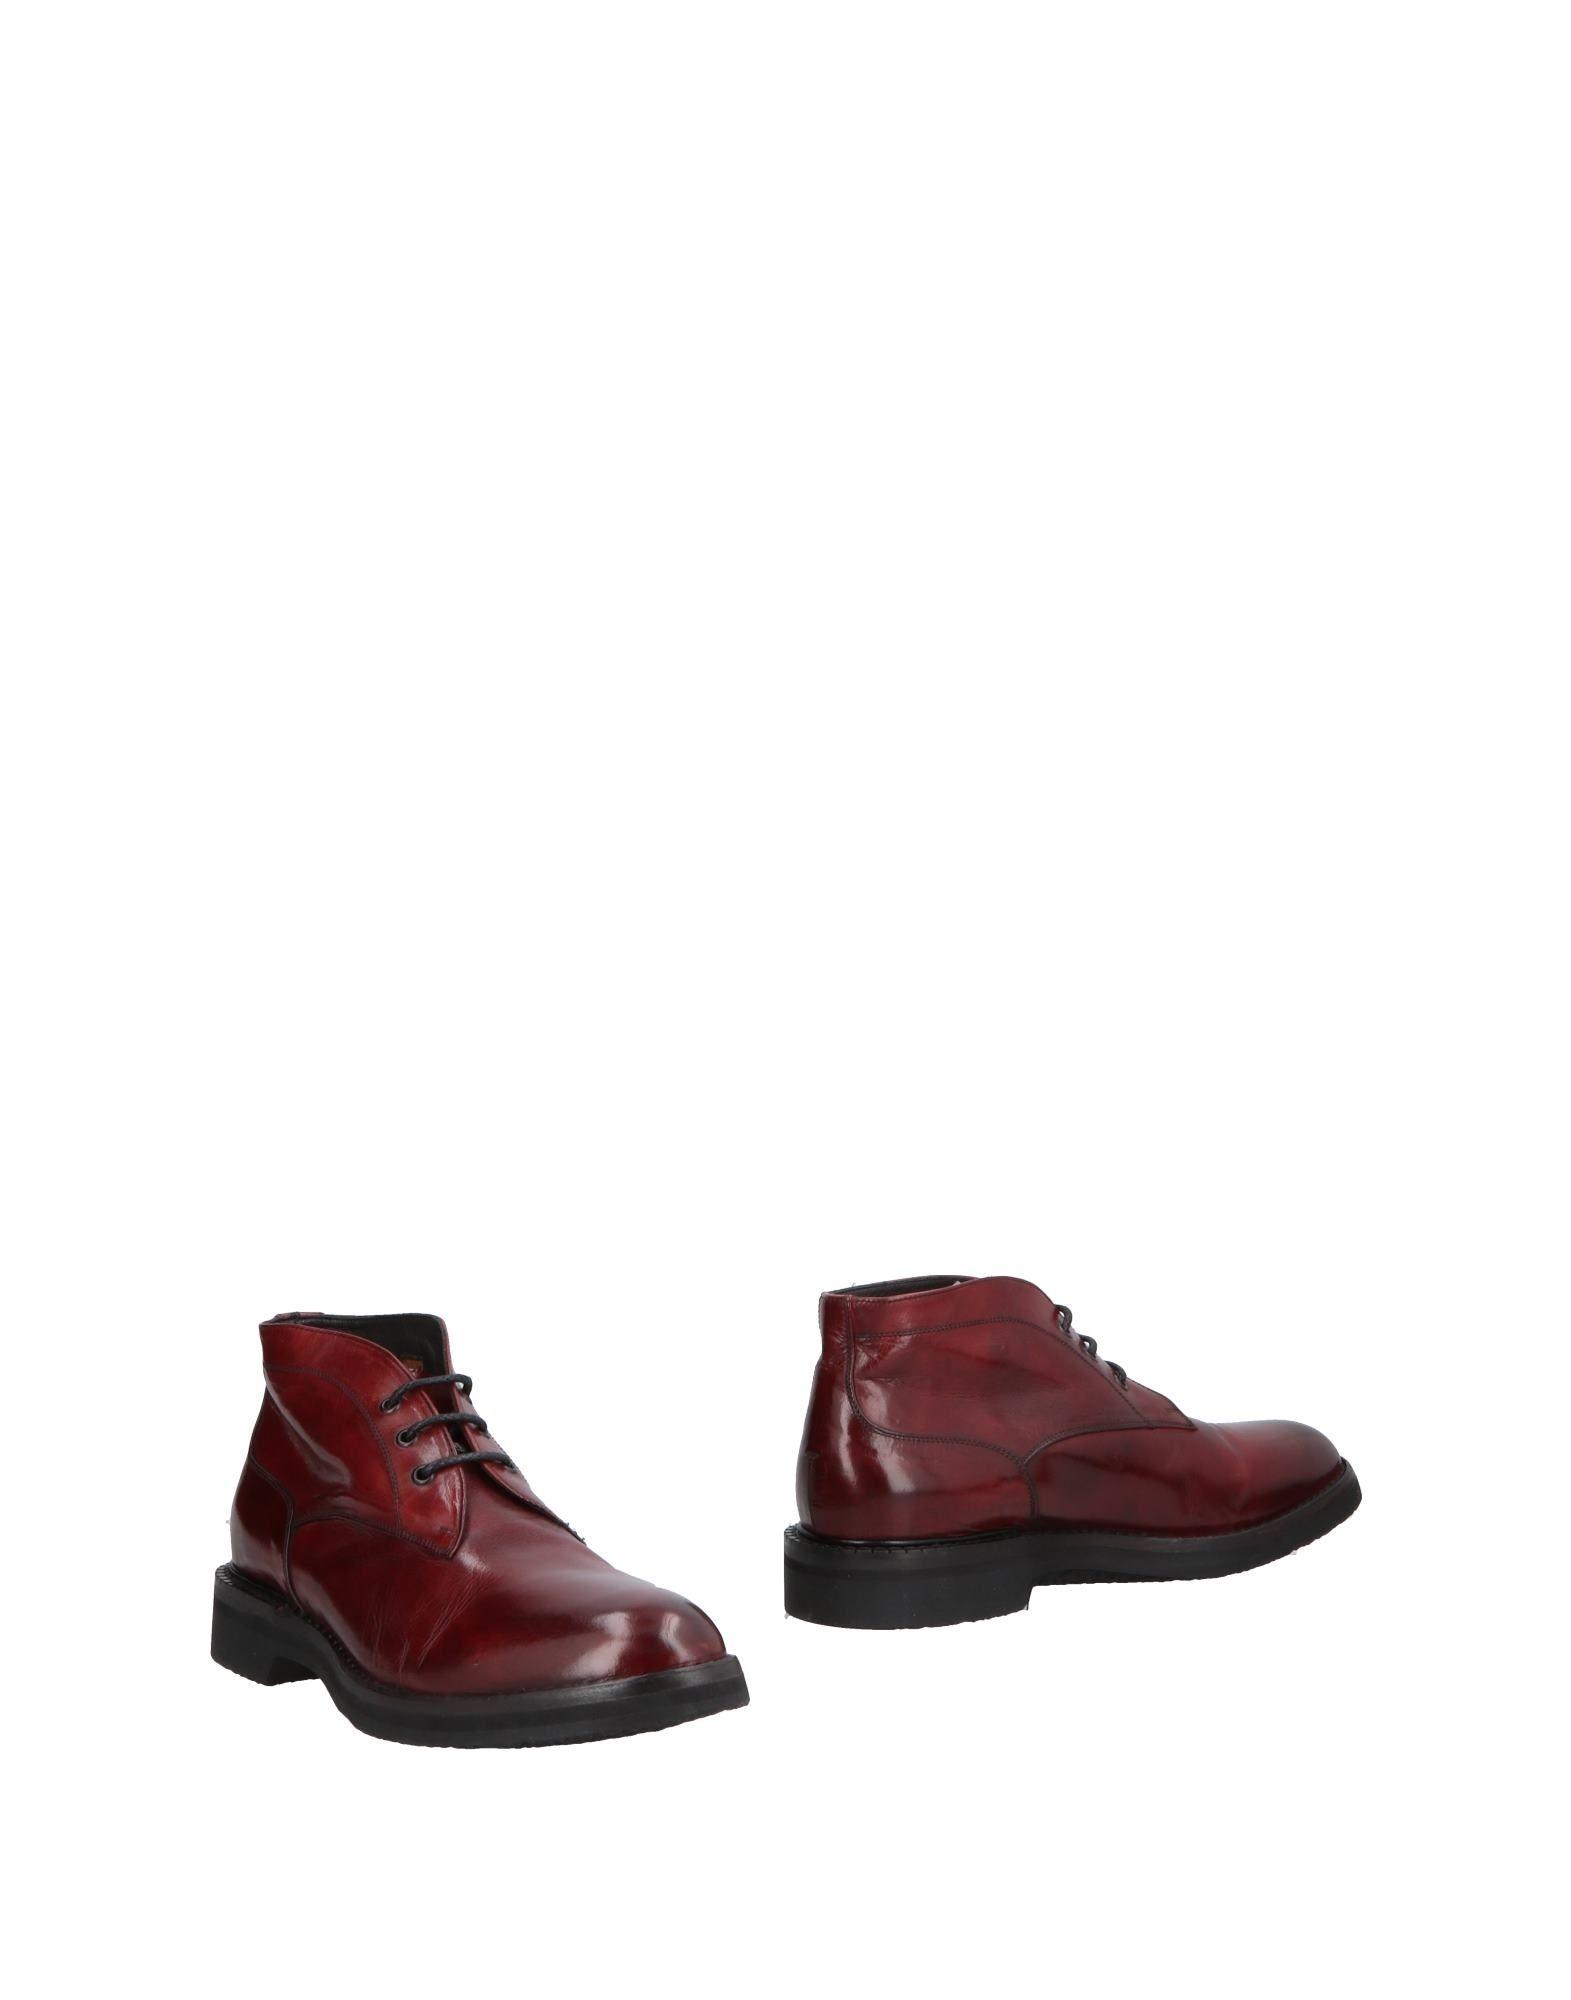 Pantanetti Stiefelette Herren  11503715KJ Gute Qualität beliebte Schuhe